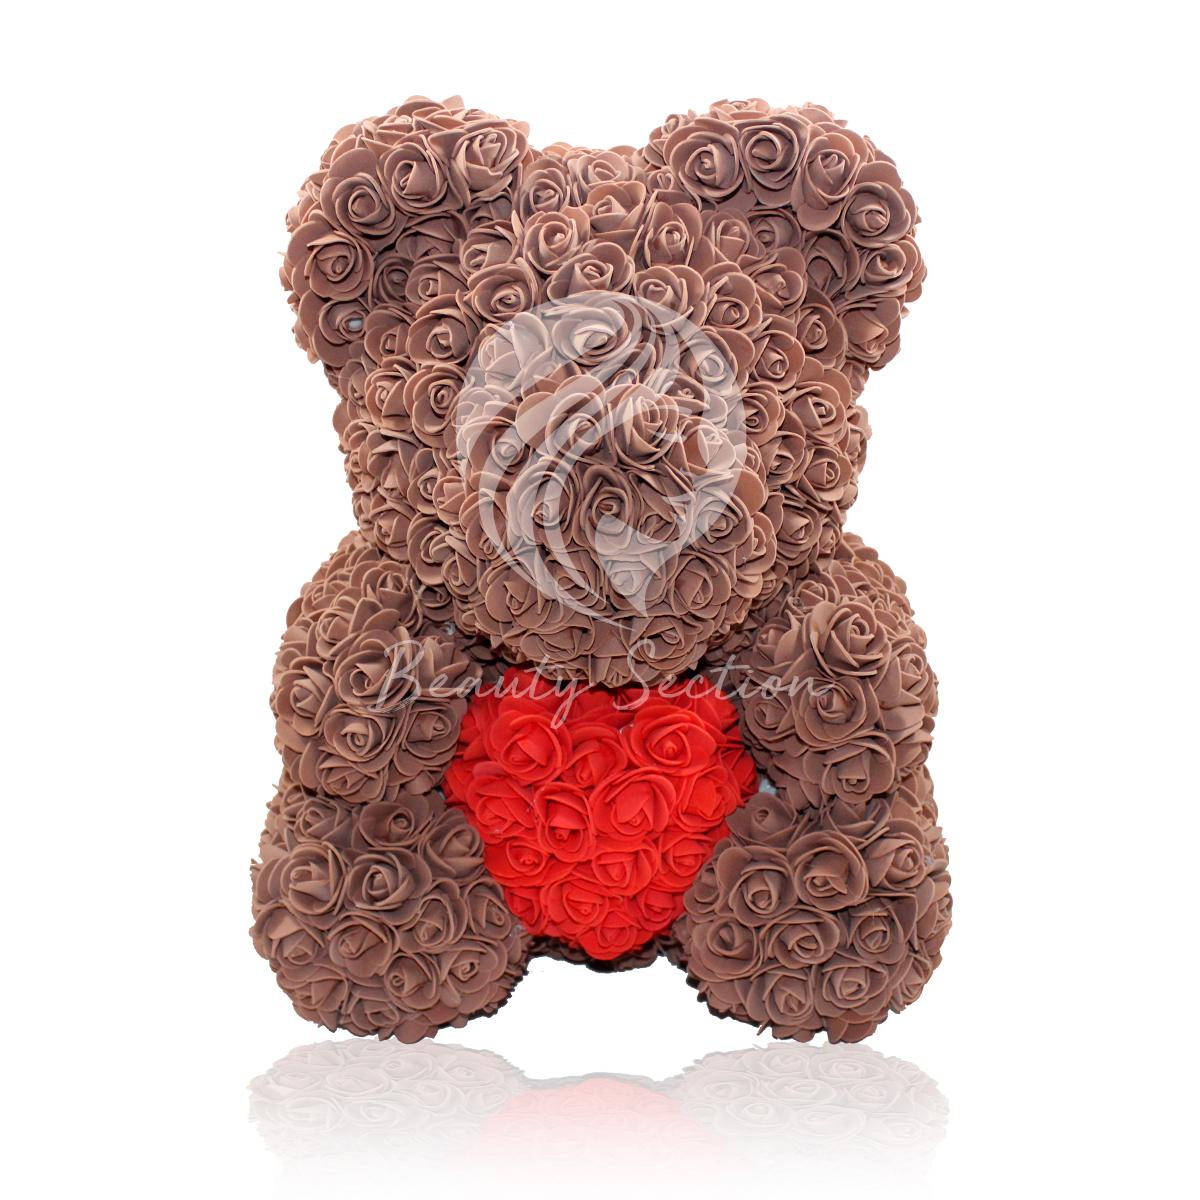 Rosenbär Braun mit rotem Herz 40cm